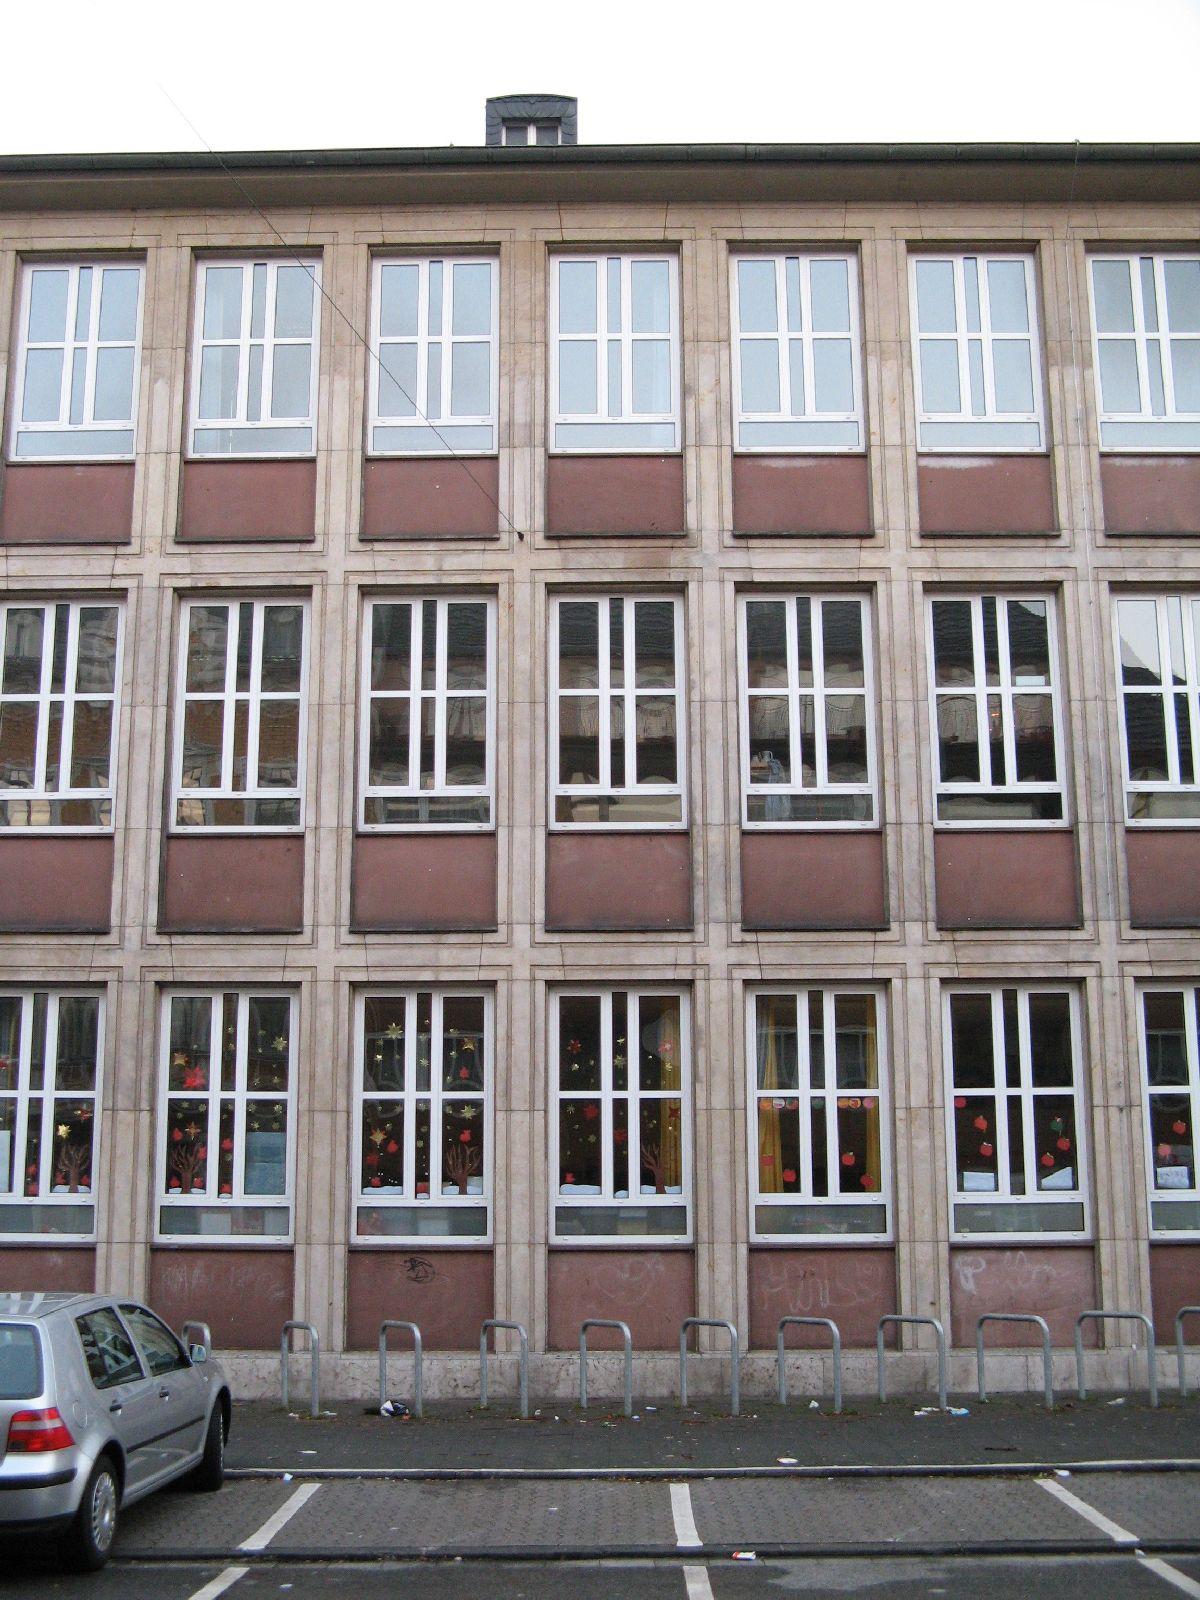 Gebaeude-Architektur_Textur_B_1266